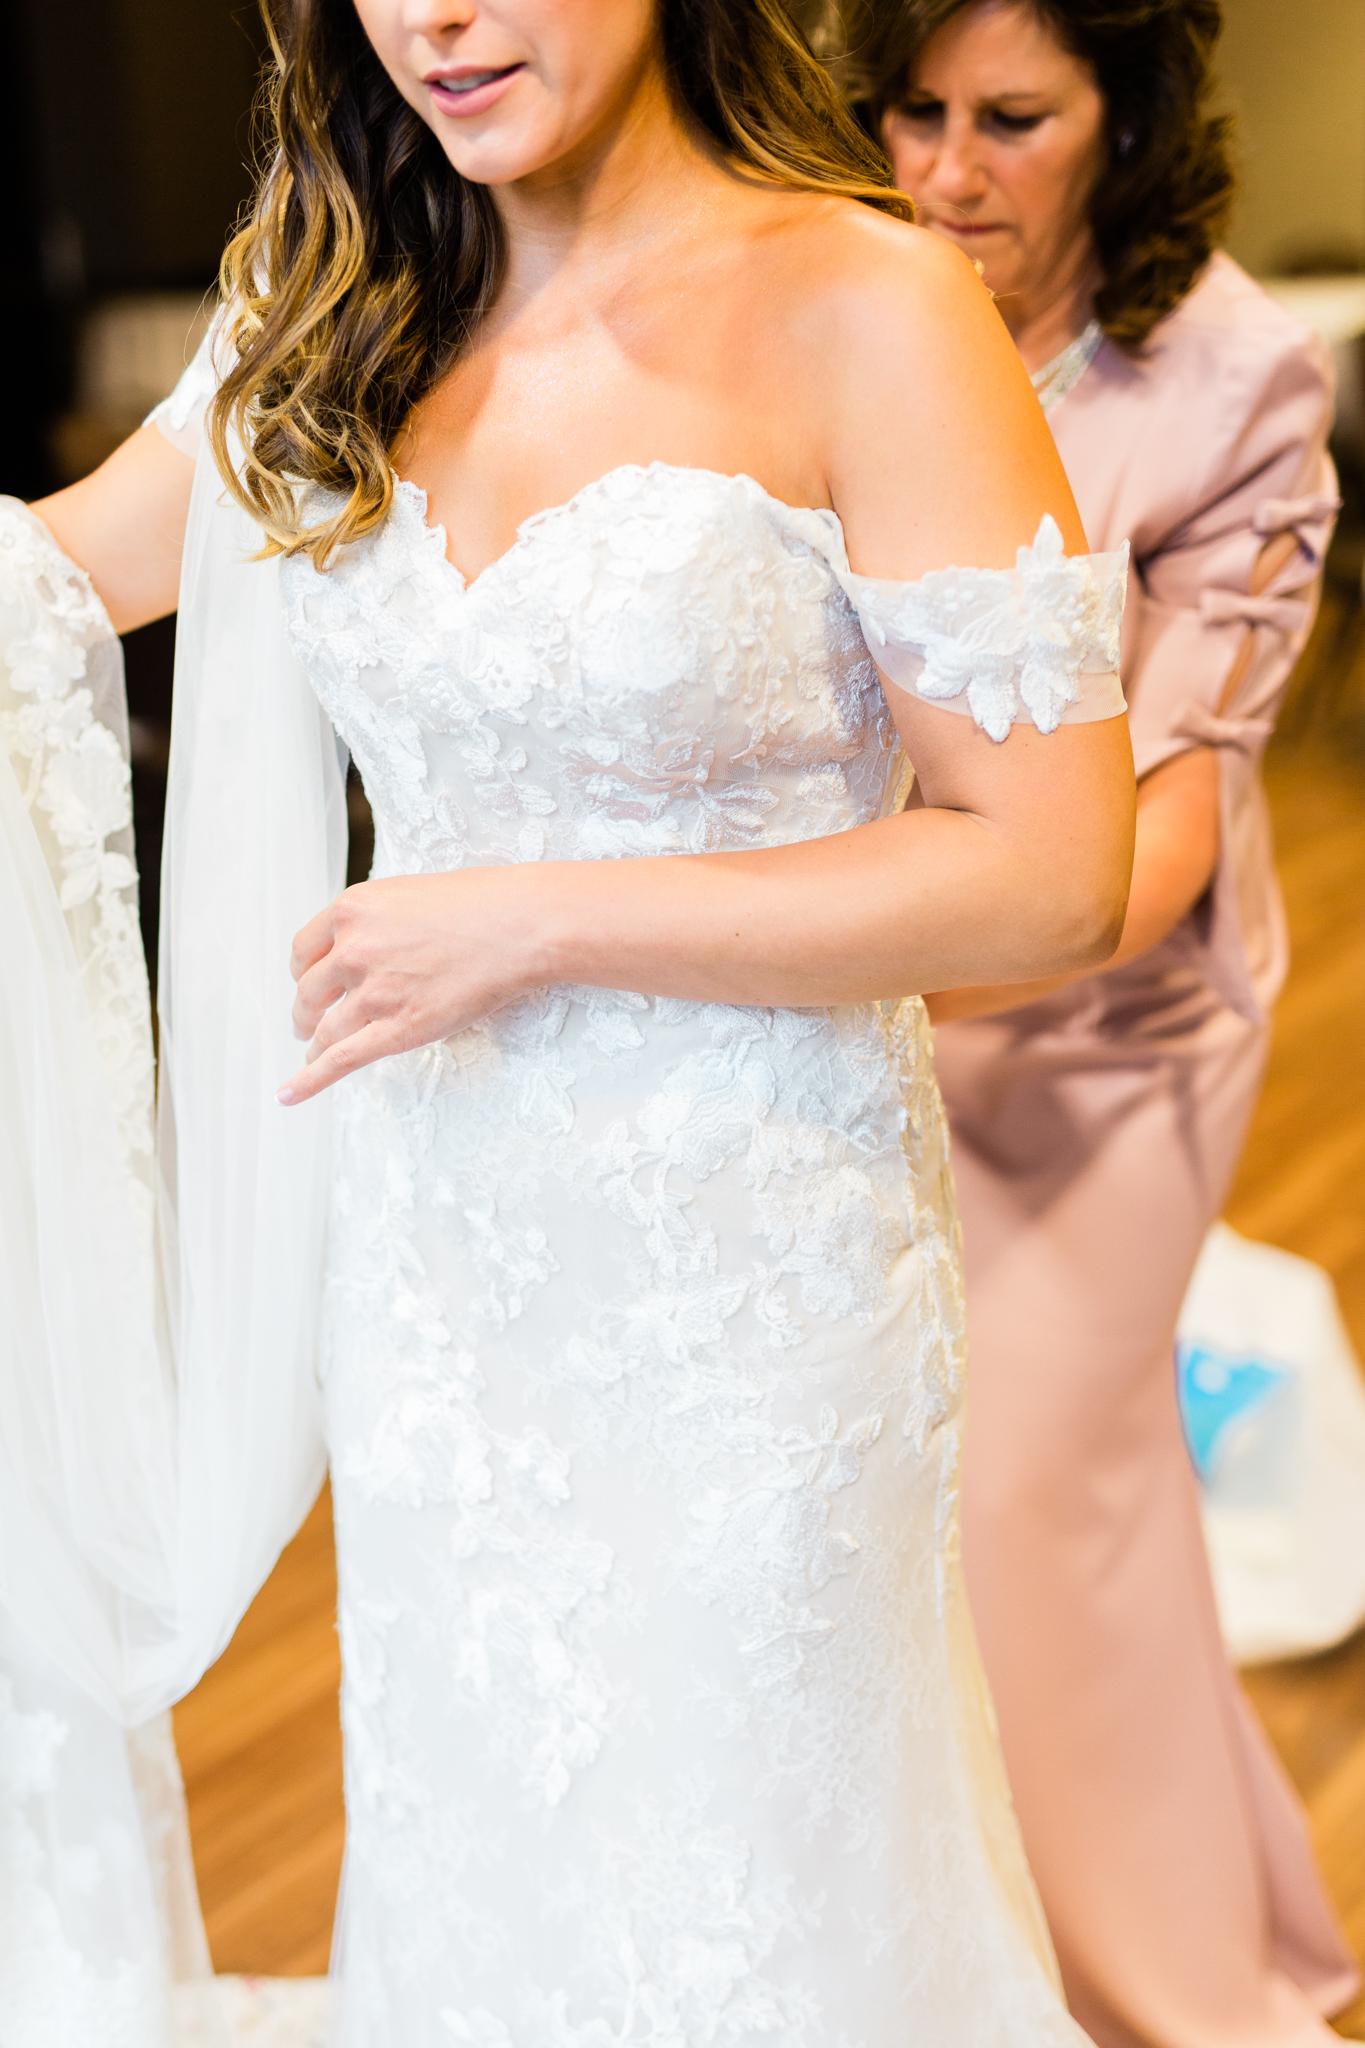 07-Katrina-Kyle-Jefferson-Inn-Wisconsin-Bride-James-Stokes-Photography.jpg